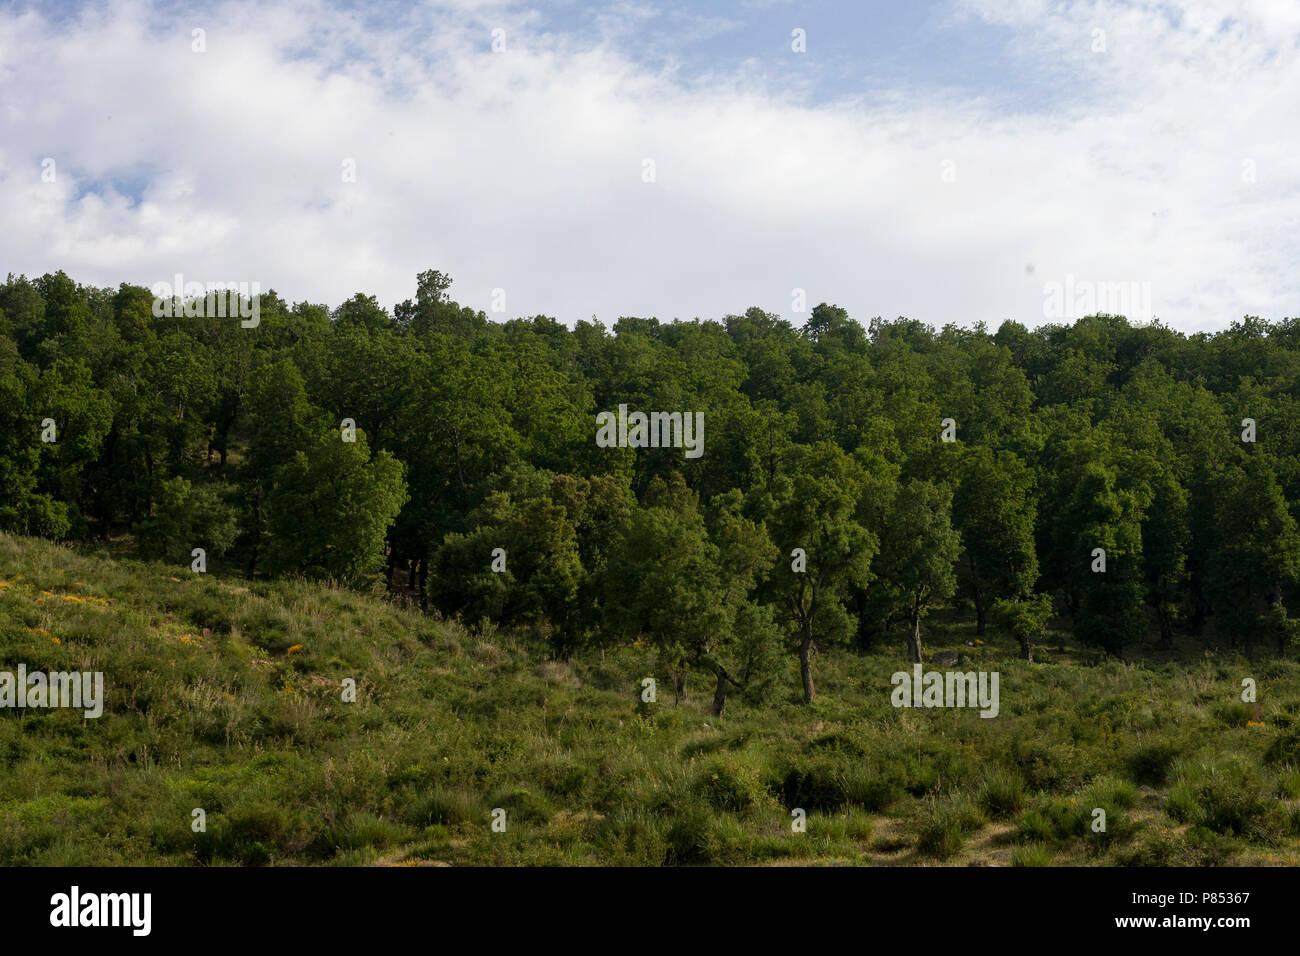 Naaldbos, Pine Forest, Petite Kabylie; Algerije; Algeria - Stock Image